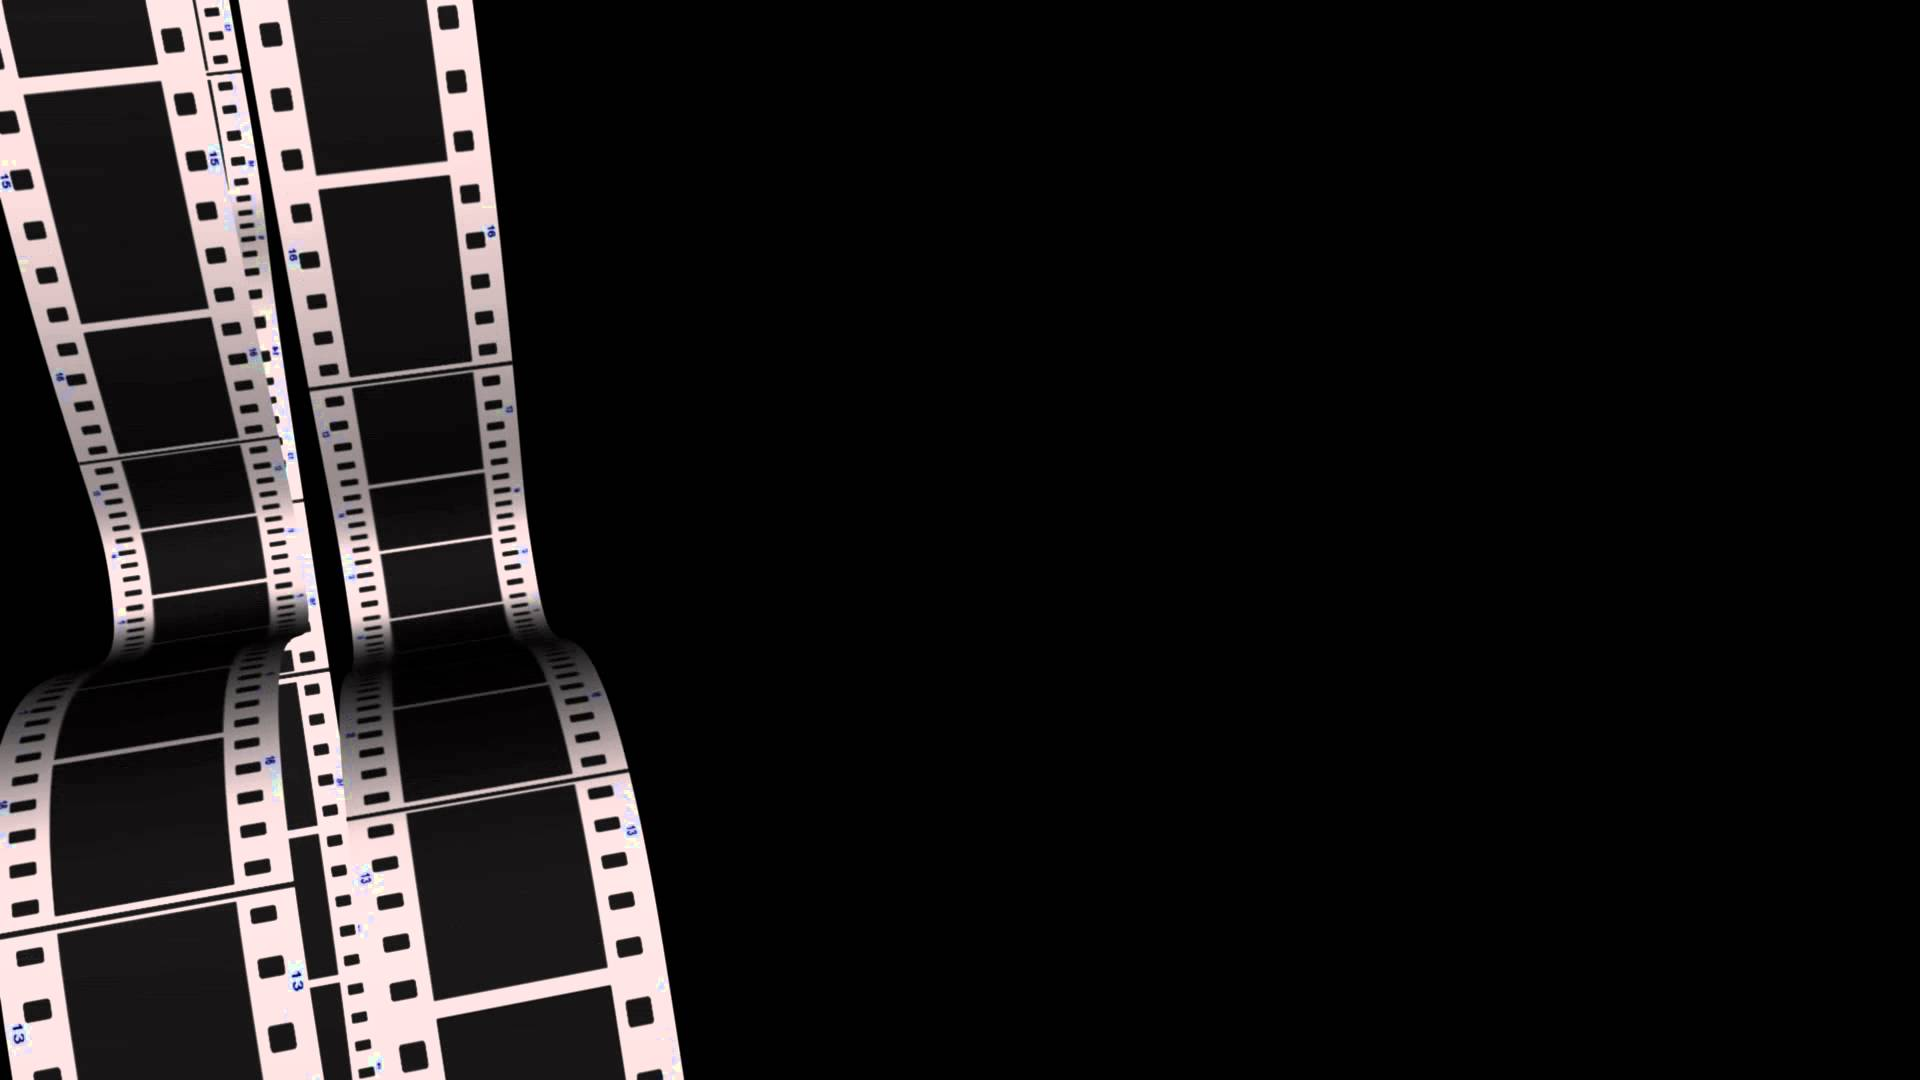 Film Strip 1920x1080